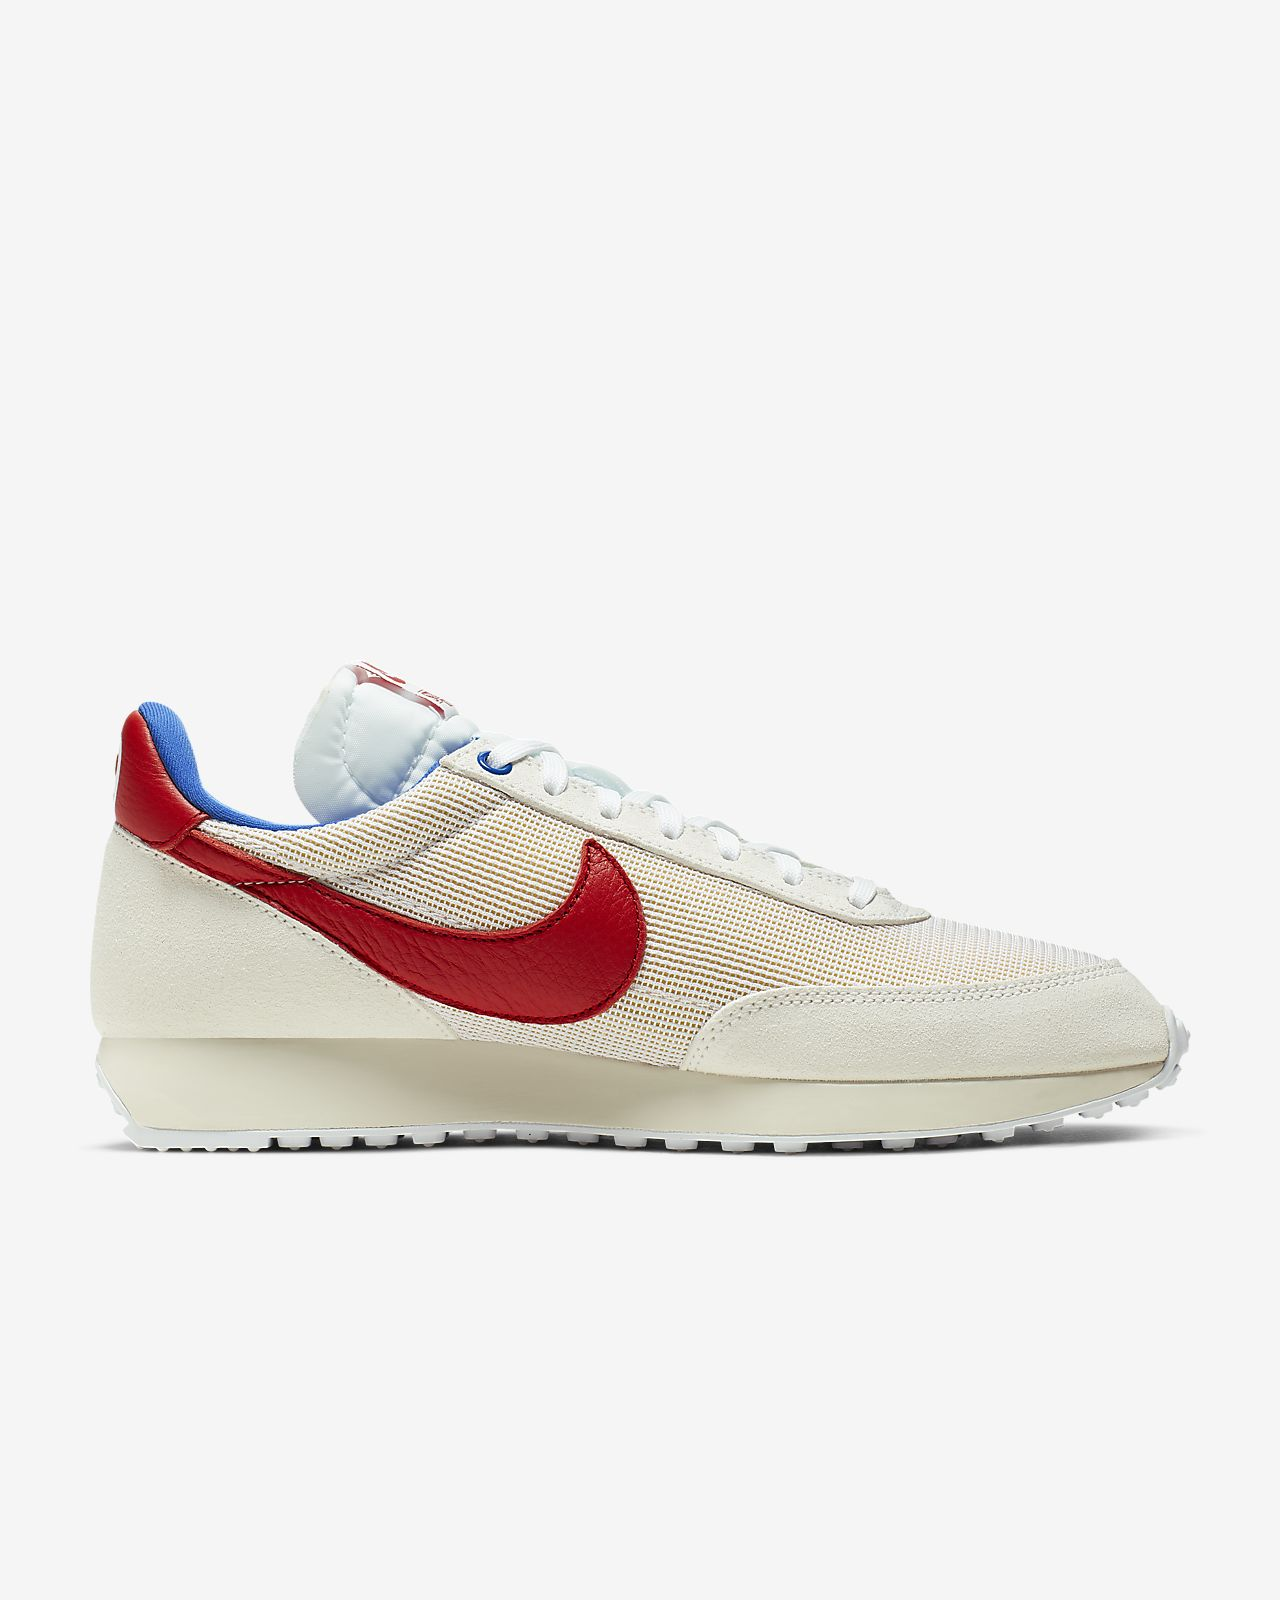 0ad5ebd6dd17 ... Nike x Stranger Things Air Tailwind 79 (4th of July) Men's Shoe